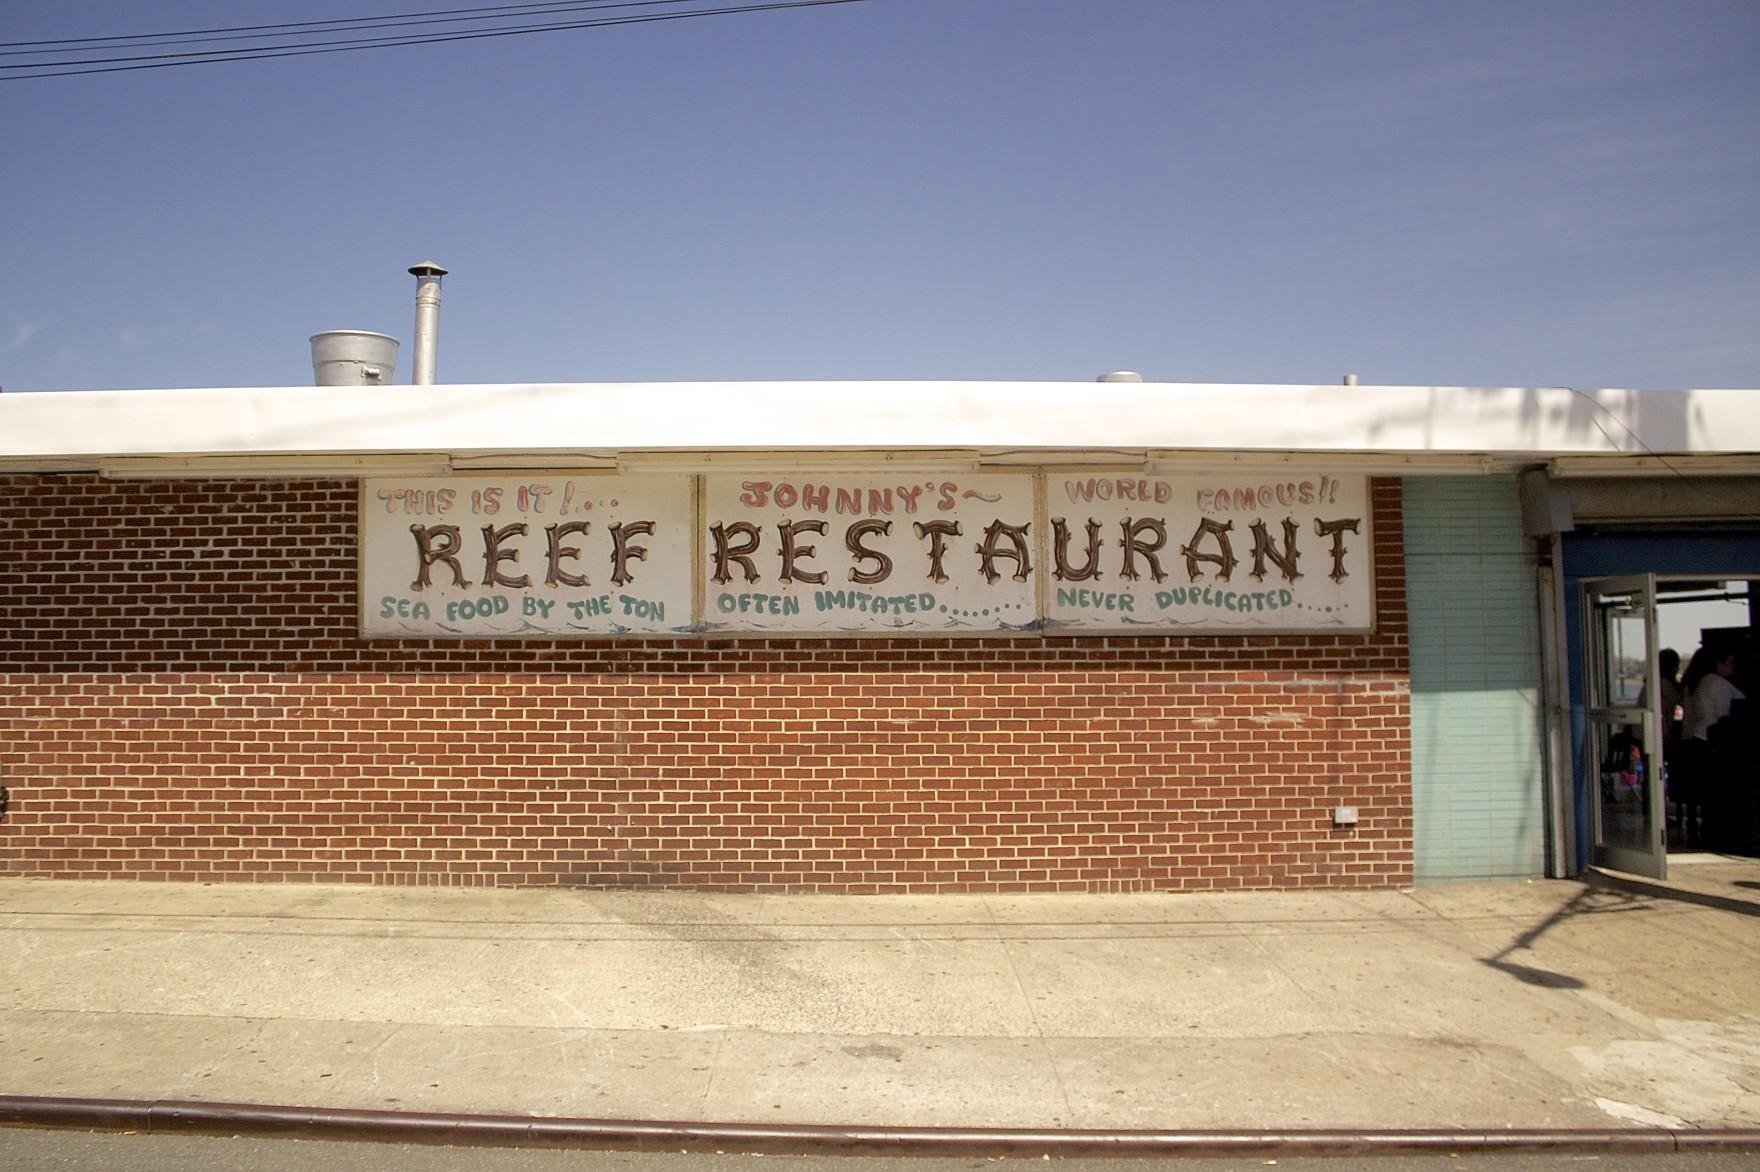 Johnny's Reef Restaurant The Bored Vegetarian